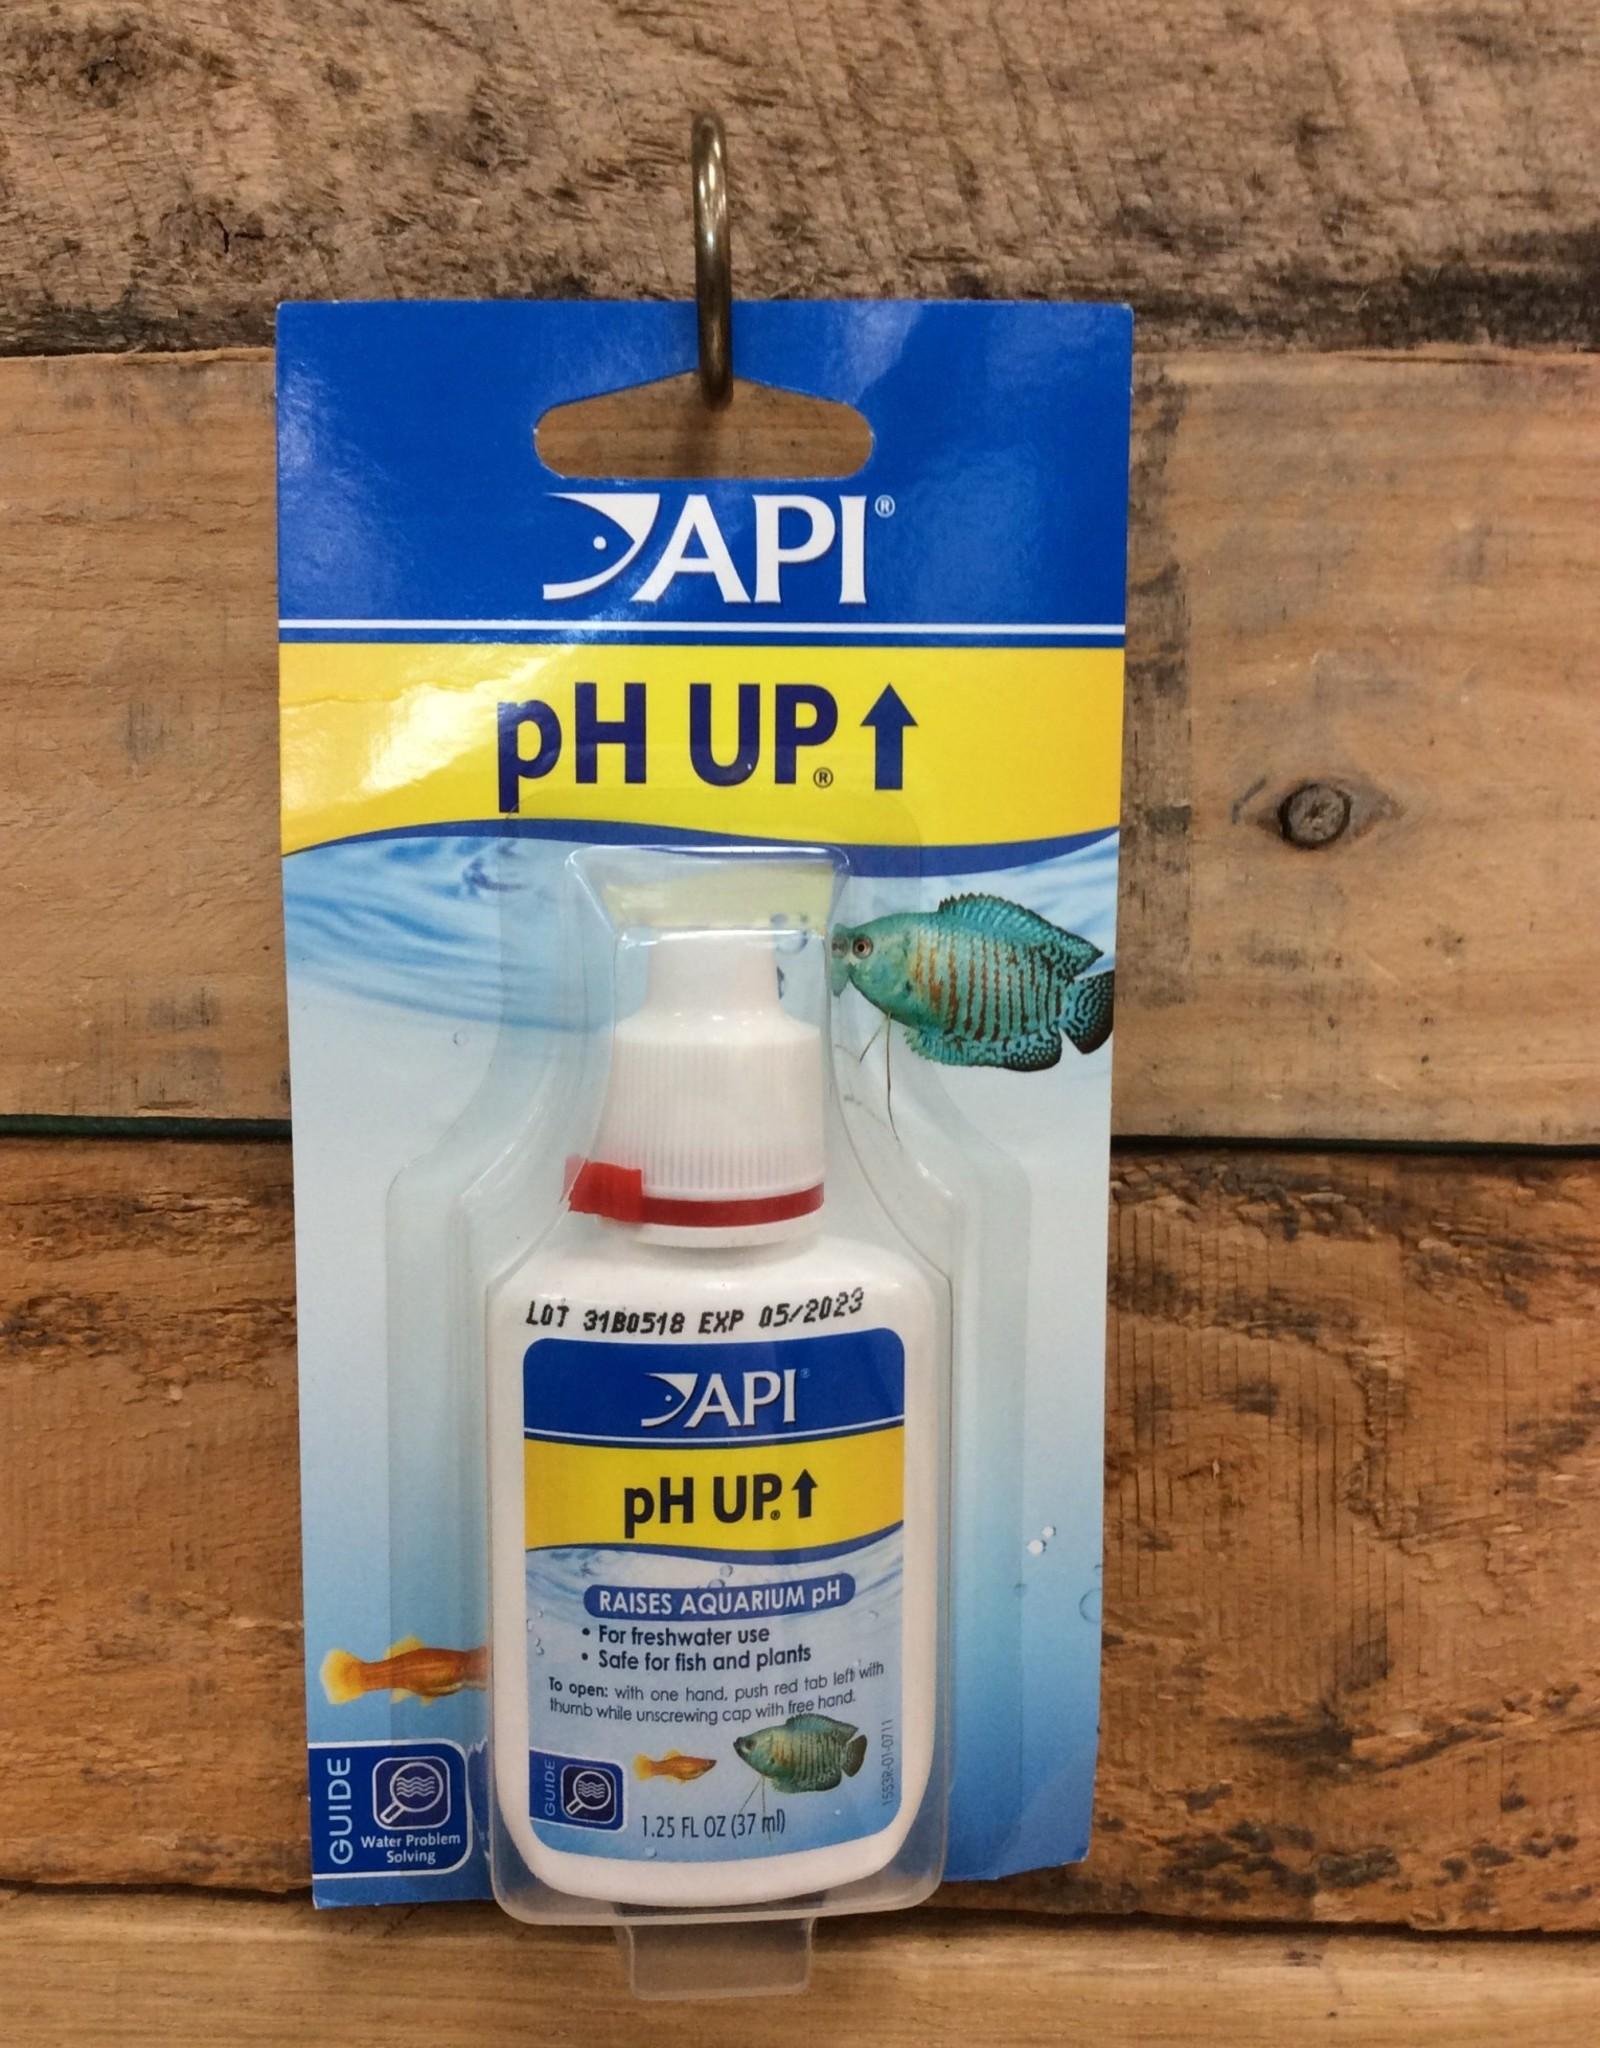 Api - Mars Fish Care API 1.25 OZ. PH UP